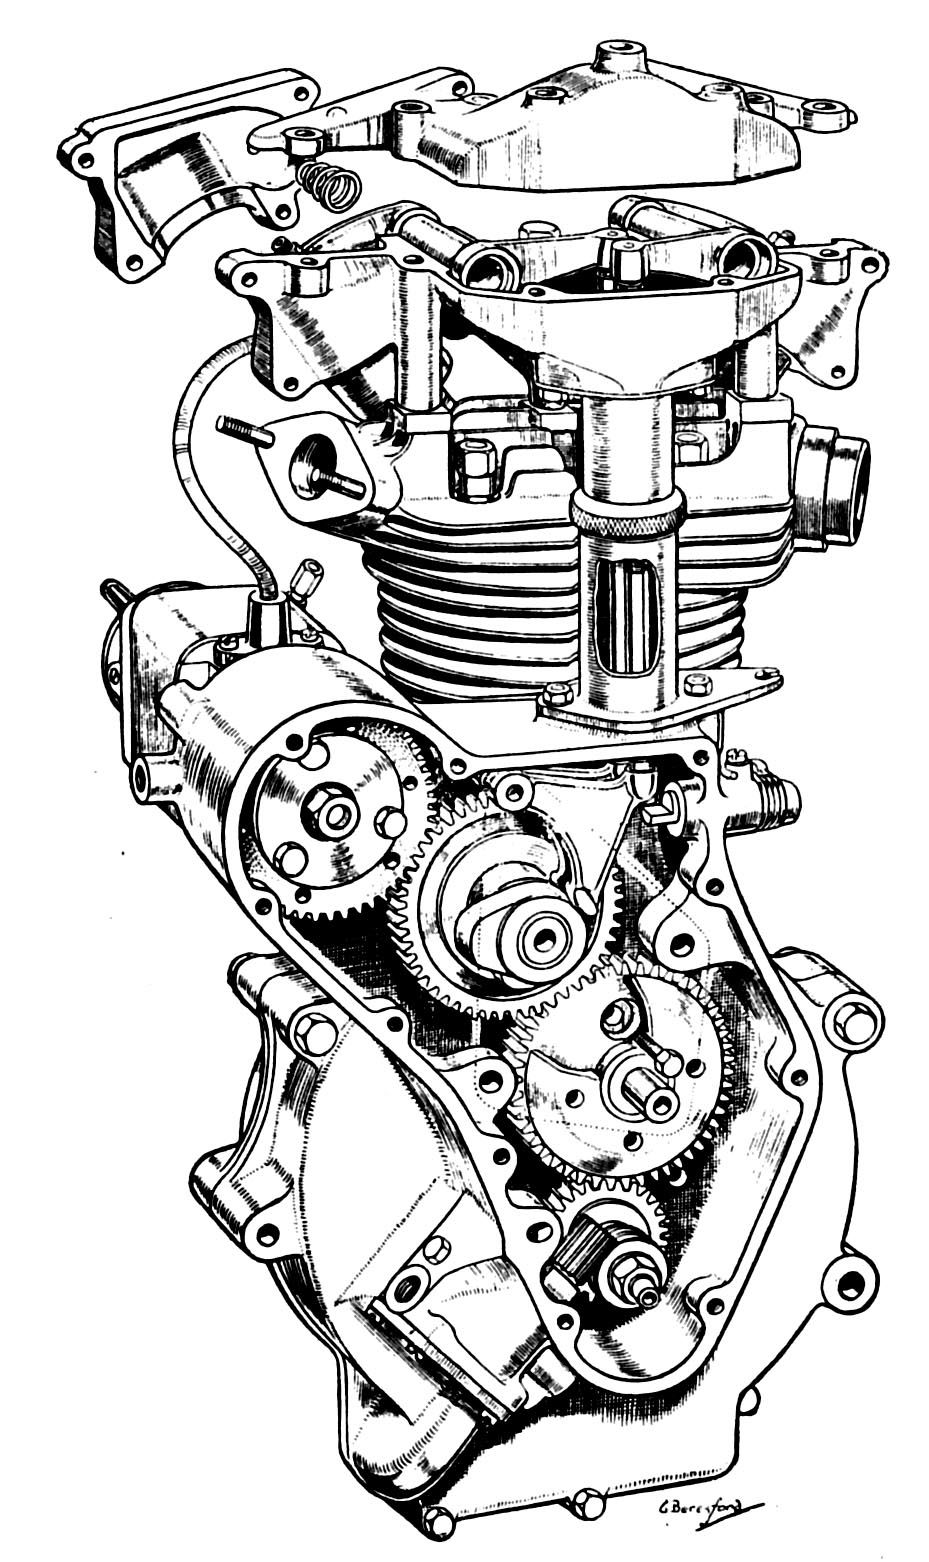 medium resolution of cutaway view of the 1973 kawasaki z1 900 engine description from pinterest com